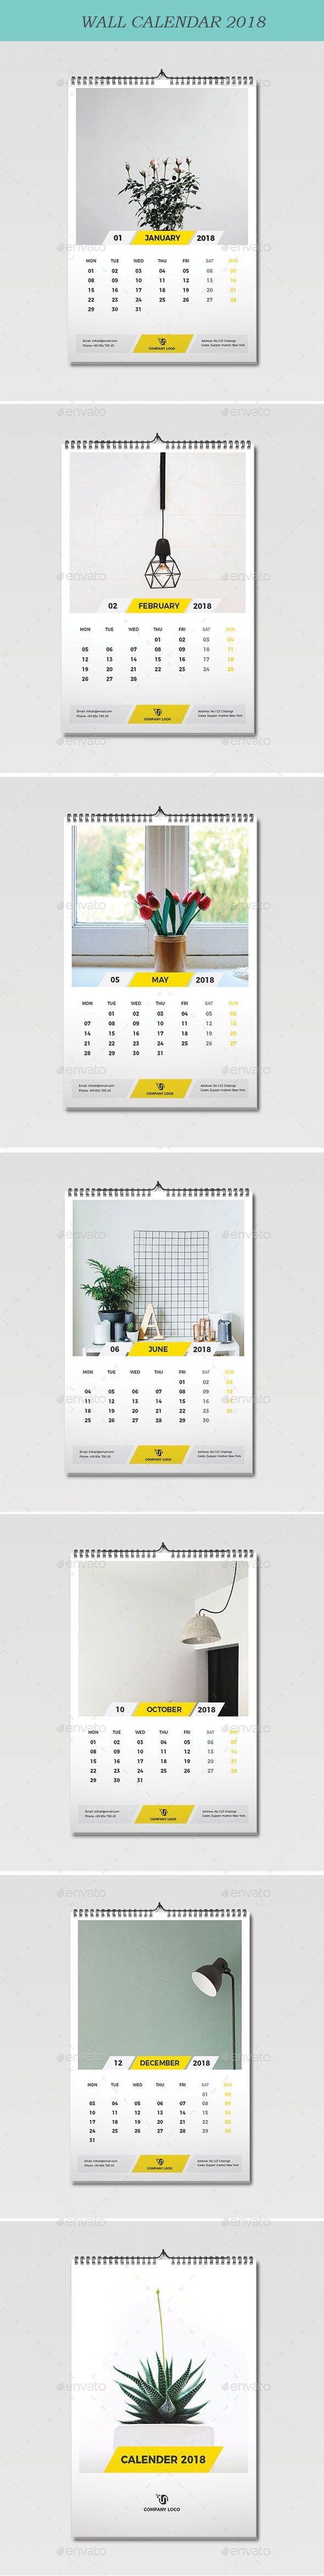 Wall Calendar 2018 Template Vector Eps Ai Illustrator Calendar